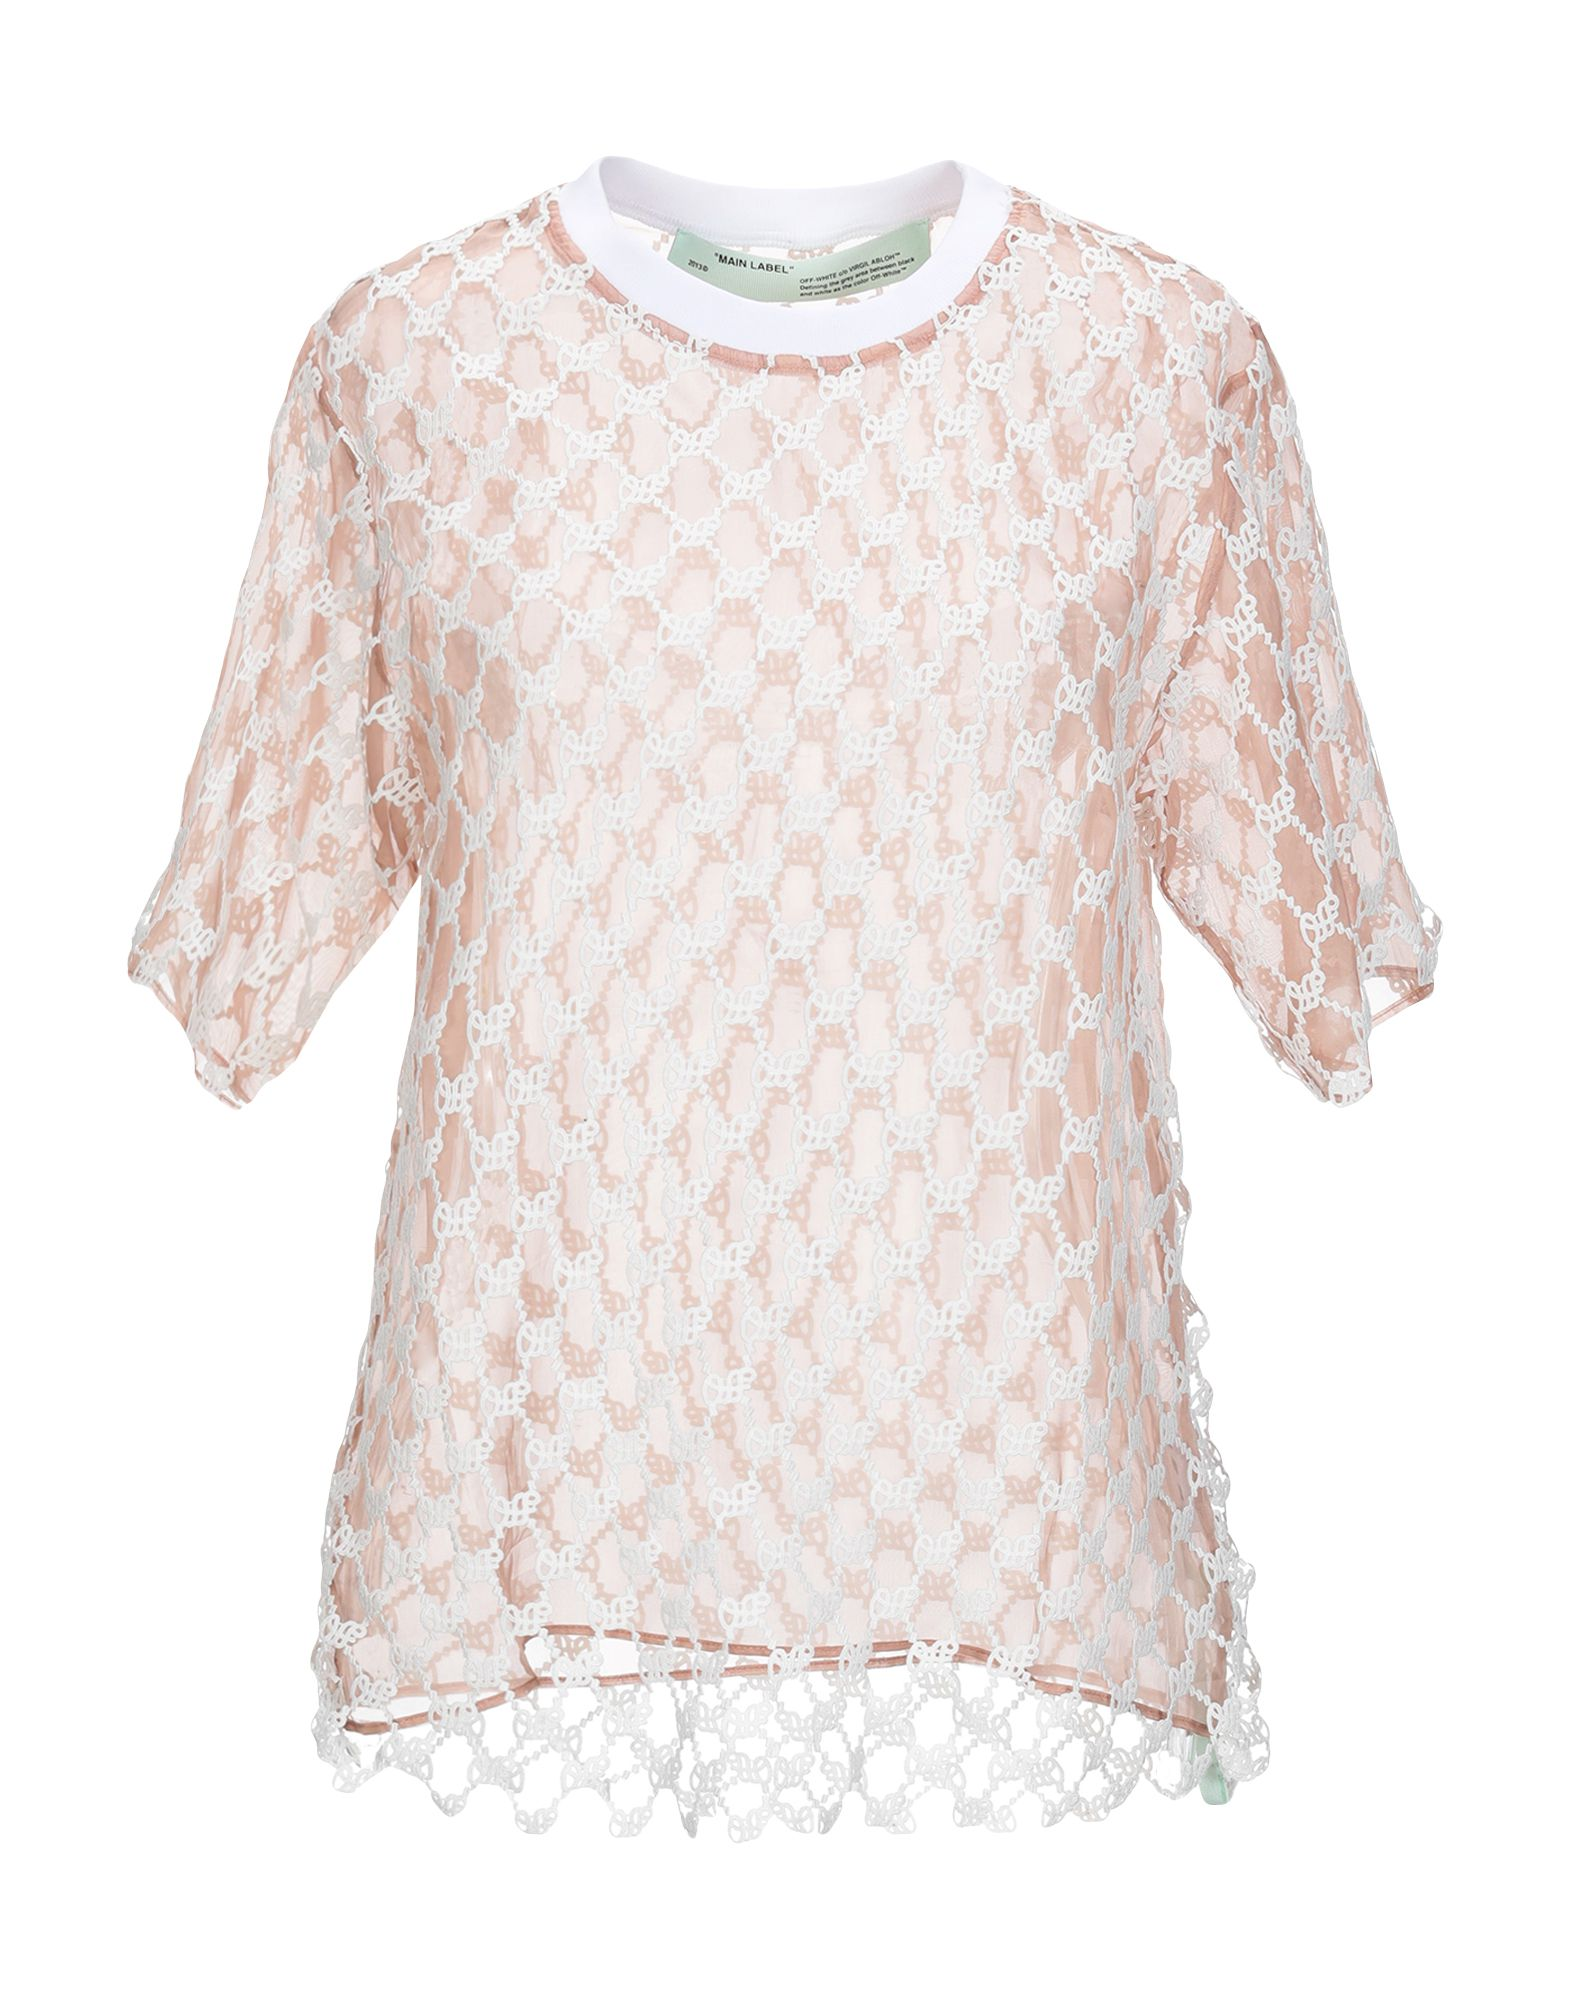 OFF-WHITE™ Blouses. lace, organza, no appliqués, two-tone, short sleeves, round collar, no pockets. 100% Cotton, Silk, Polyamide, Elastane